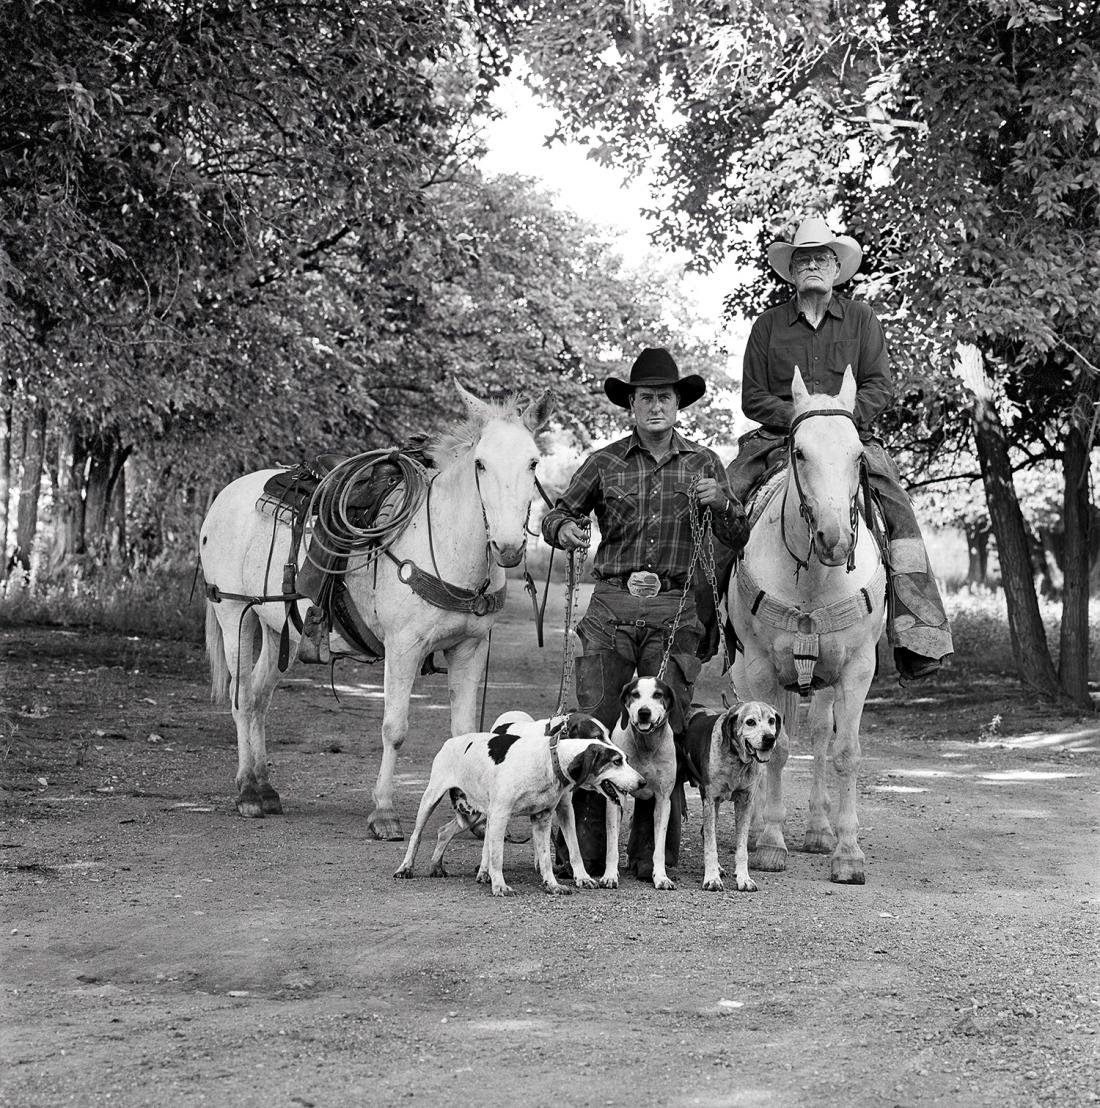 Laura Wilson, Mountain Lion Hunters, Fort Davis, Texas August 1, 1991